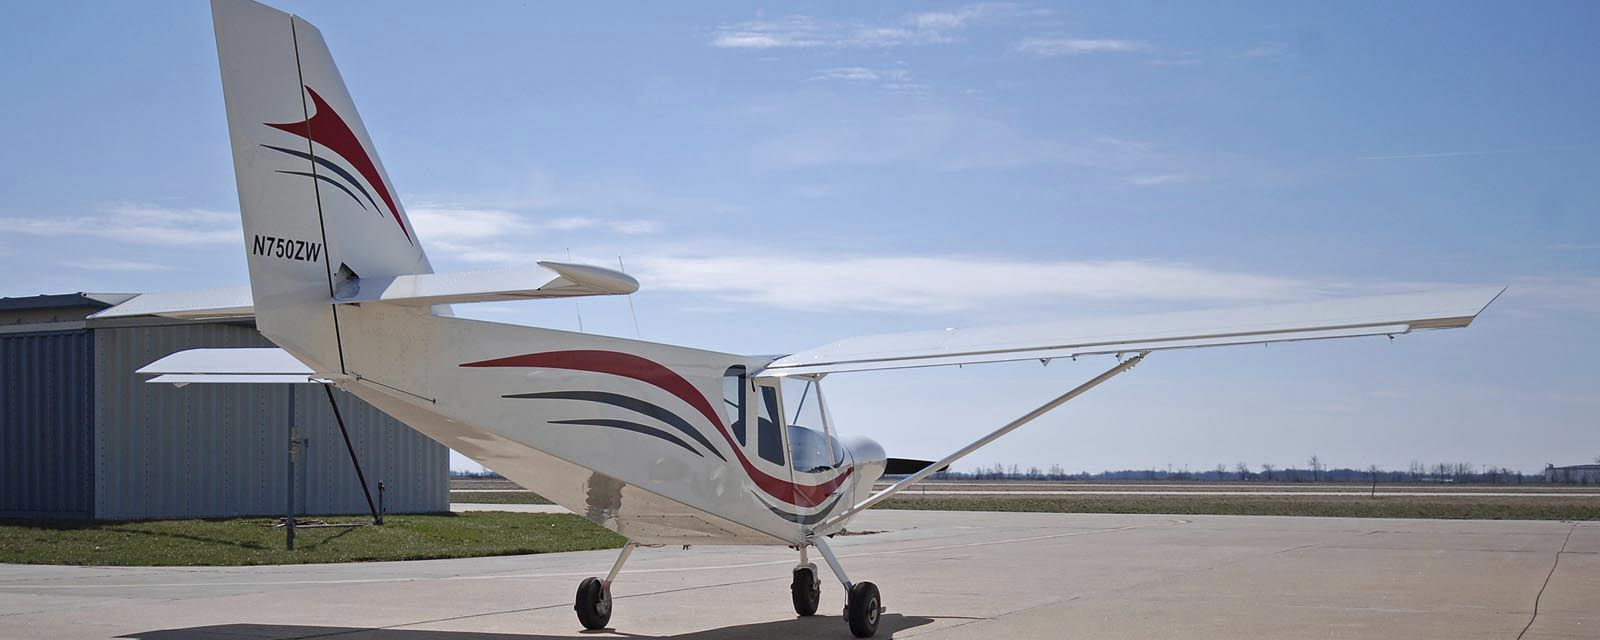 2-person LSA / 4-stroke engine / single-engine / kit - CH750 Cruzer